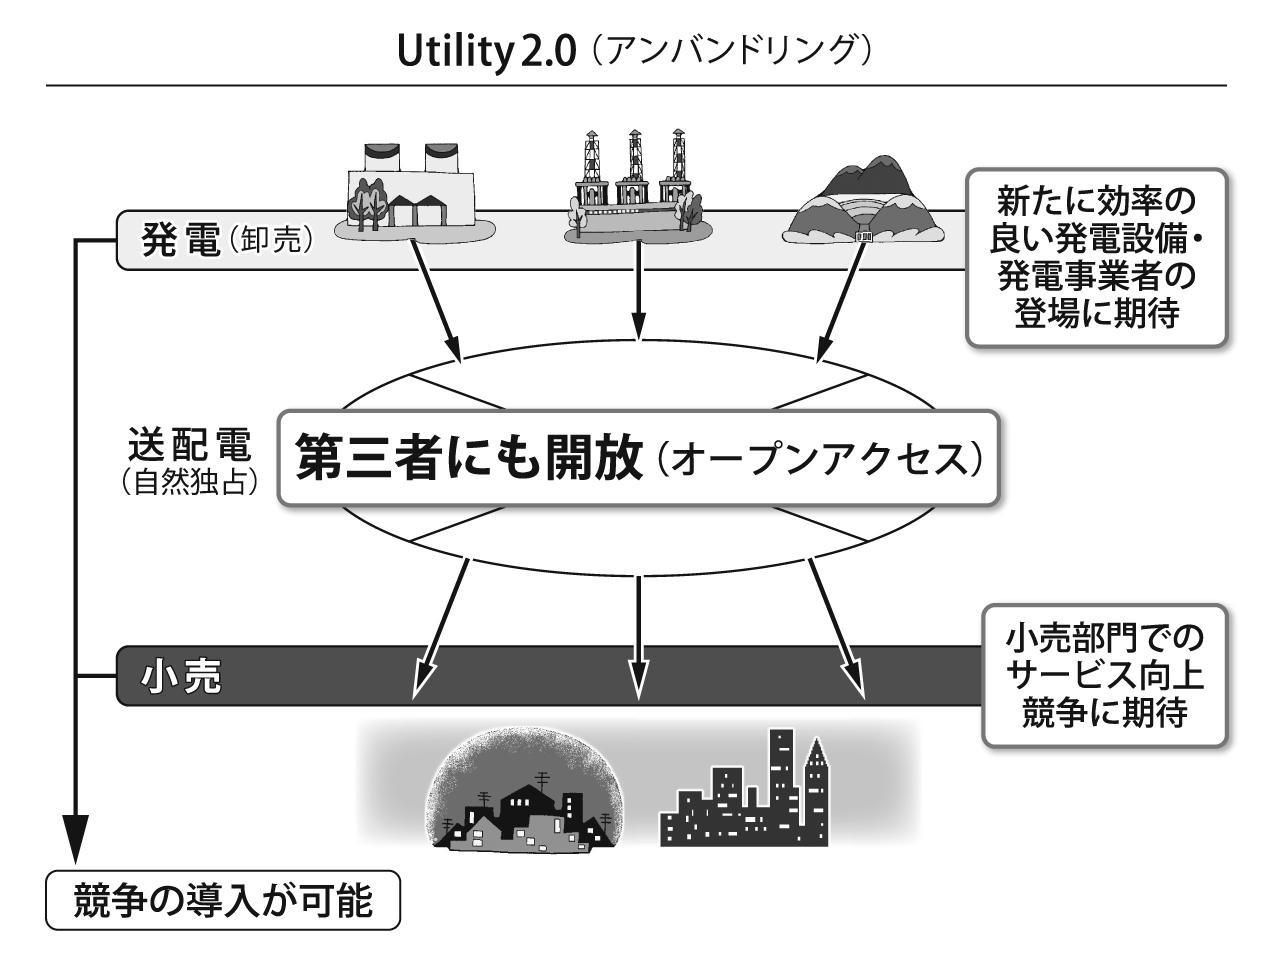 T&T Utility3.0-1-2